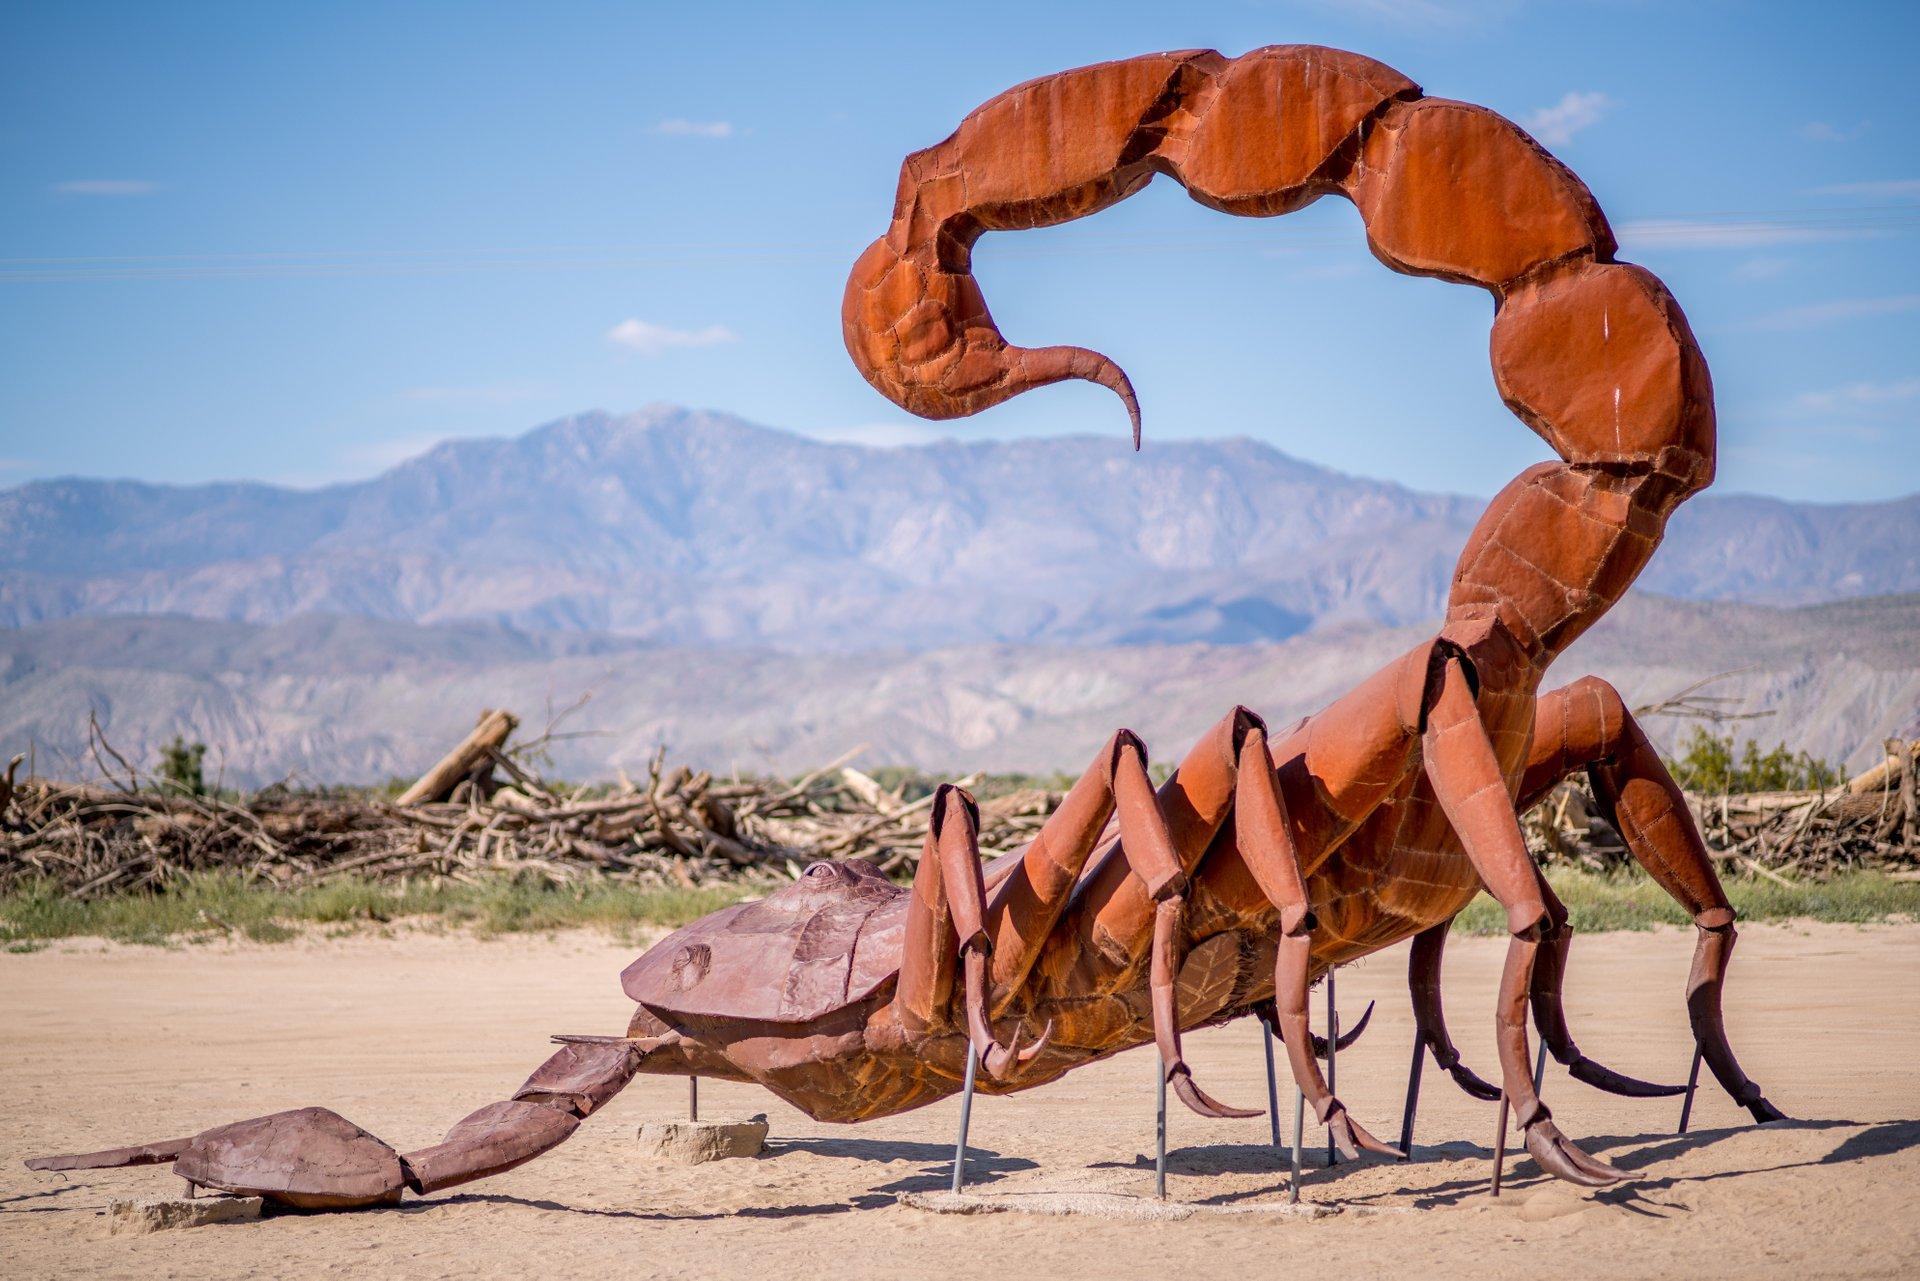 Borrego Springs Metal Sculptures in California - Best Time